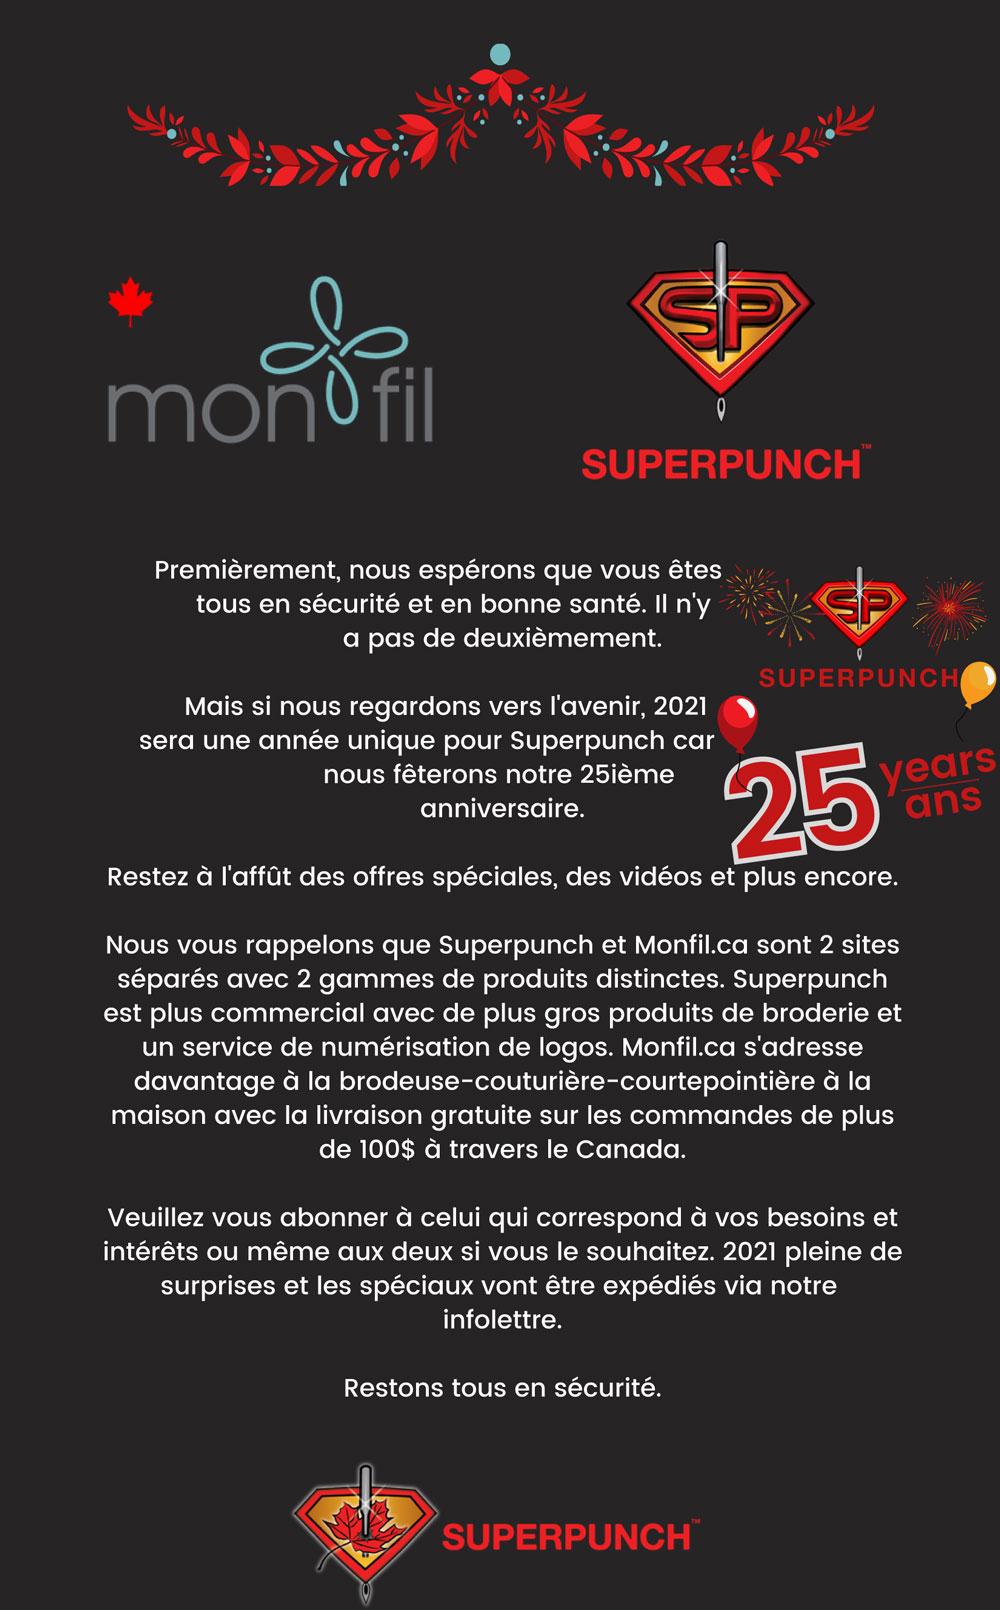 superpunch 25 ans